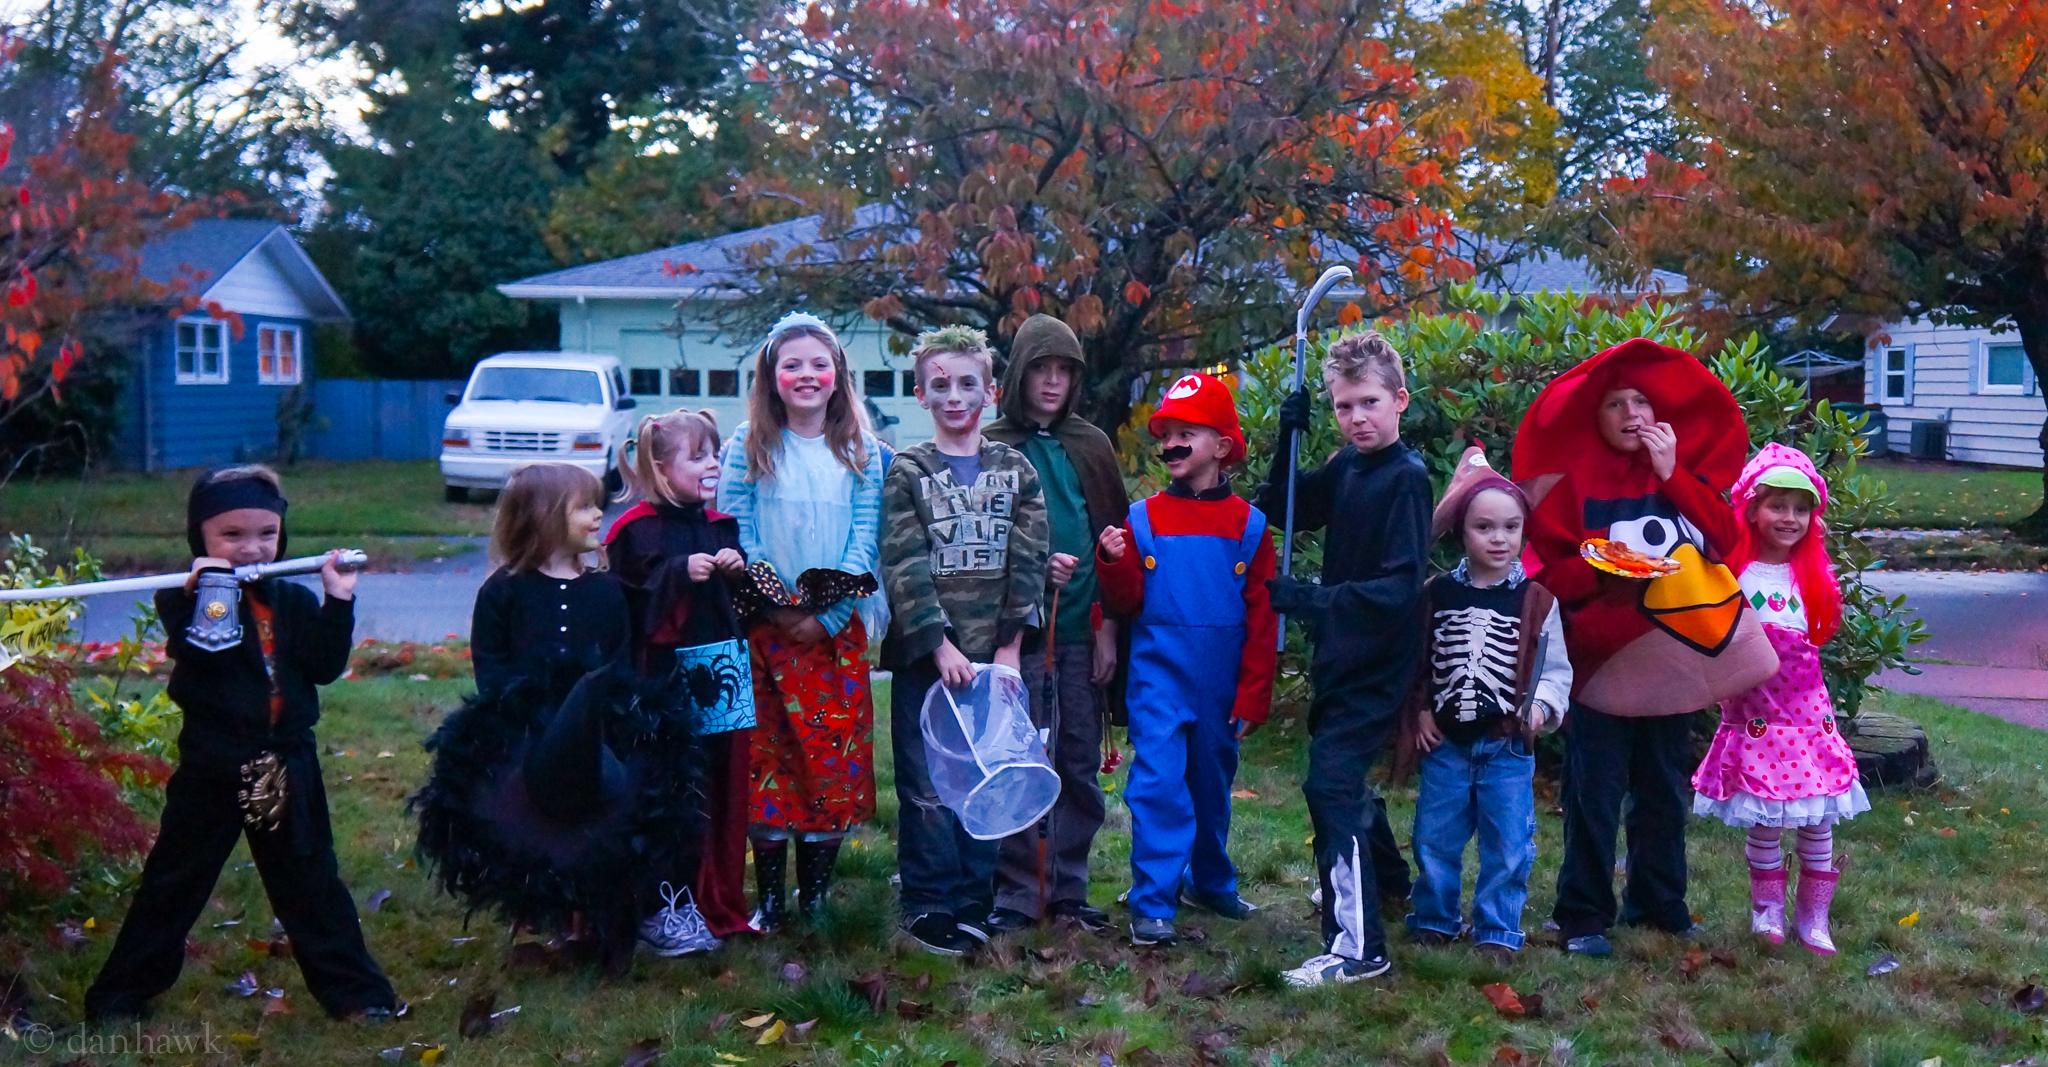 Halloween Crew | 365 Project | Oct 31st, 2012